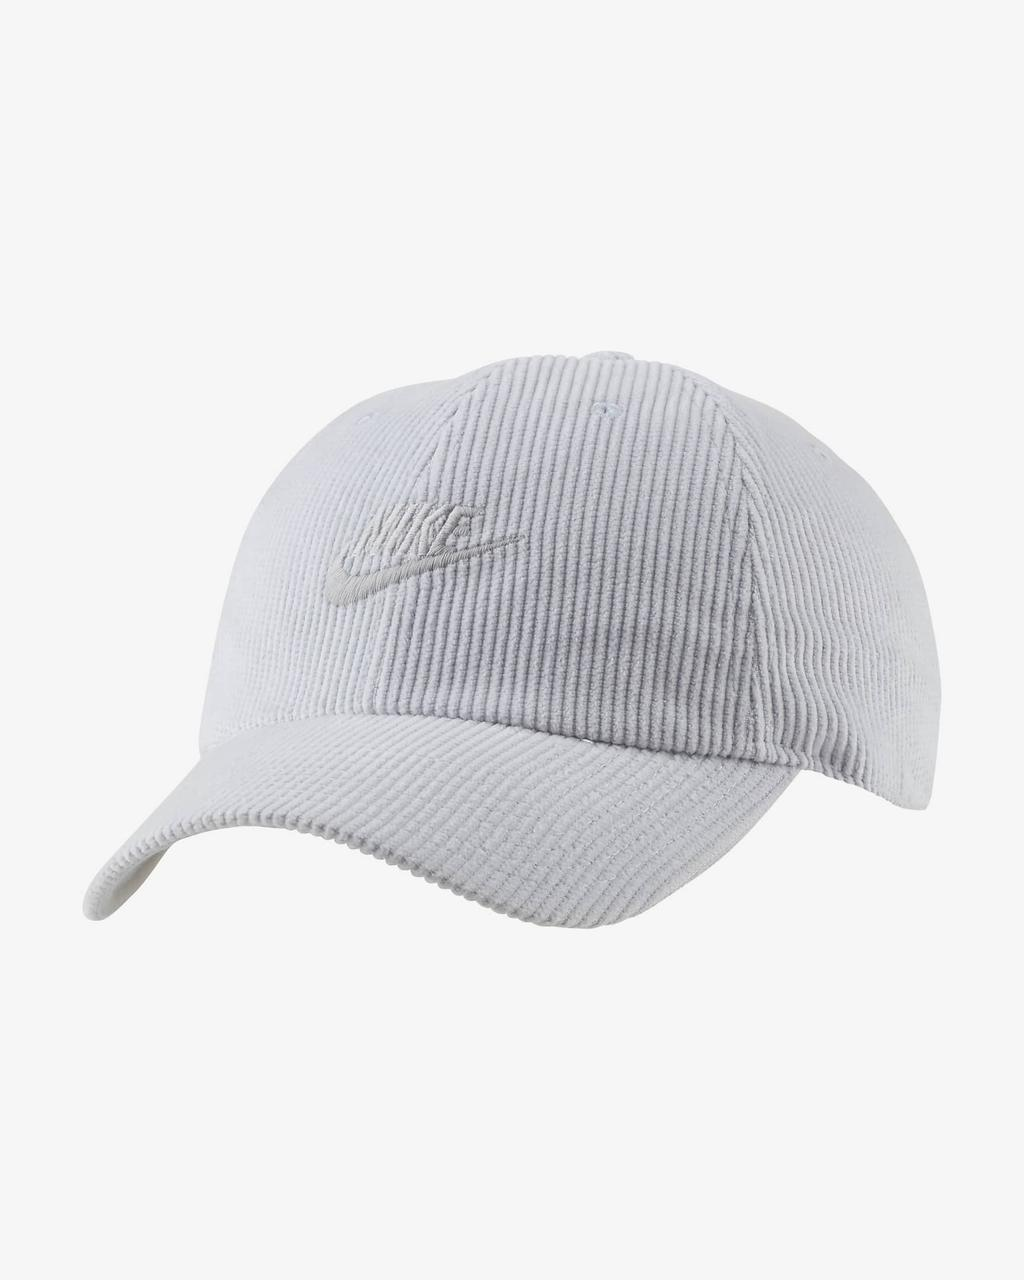 Кепка Nike Sportswear Heritage 86 DC4015-043 Белый